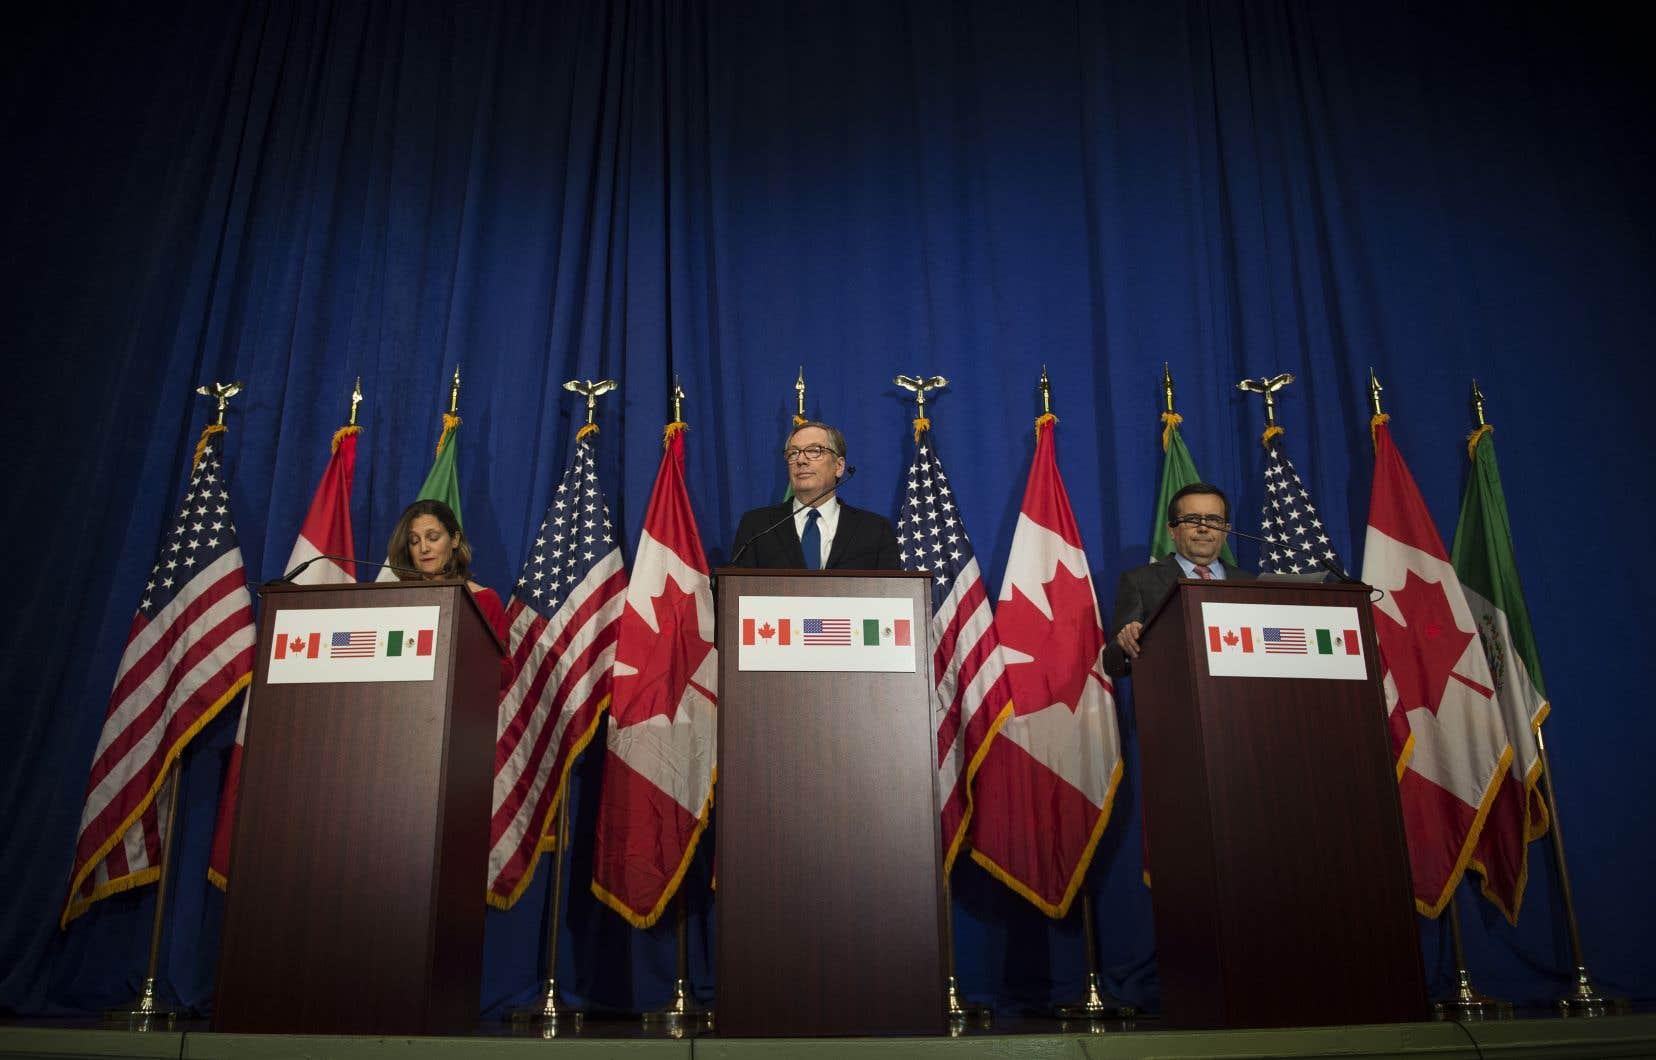 Les négociateurs canadien, américain et mexicain,Chrystia Freeland,Robert Lighthizer etIldefonso Guajardo Villarreal, en octobre dernier